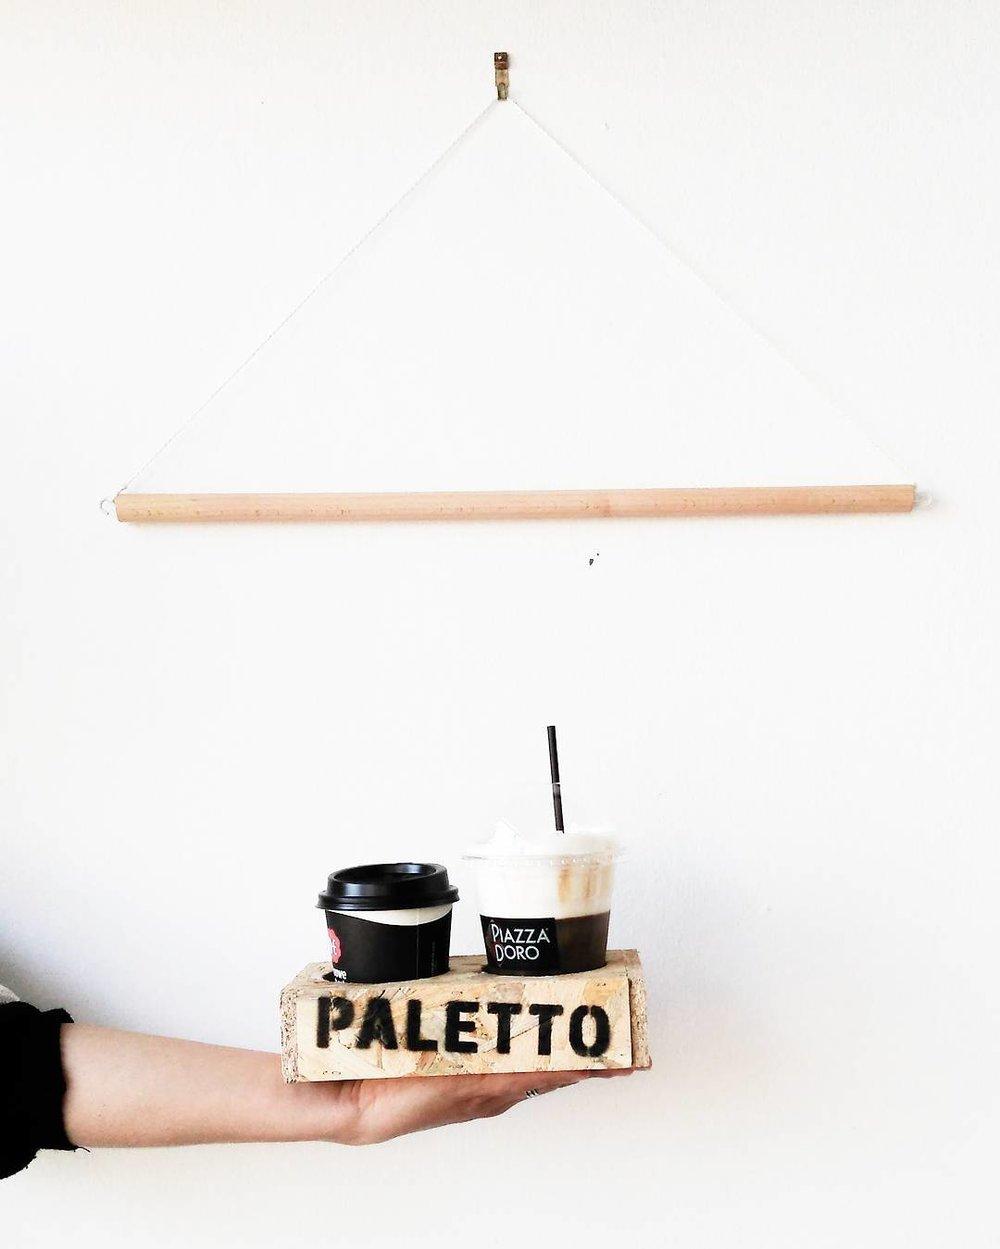 IDEABAR STUDIO - PALETTO IDENTITY COMMUNICATION